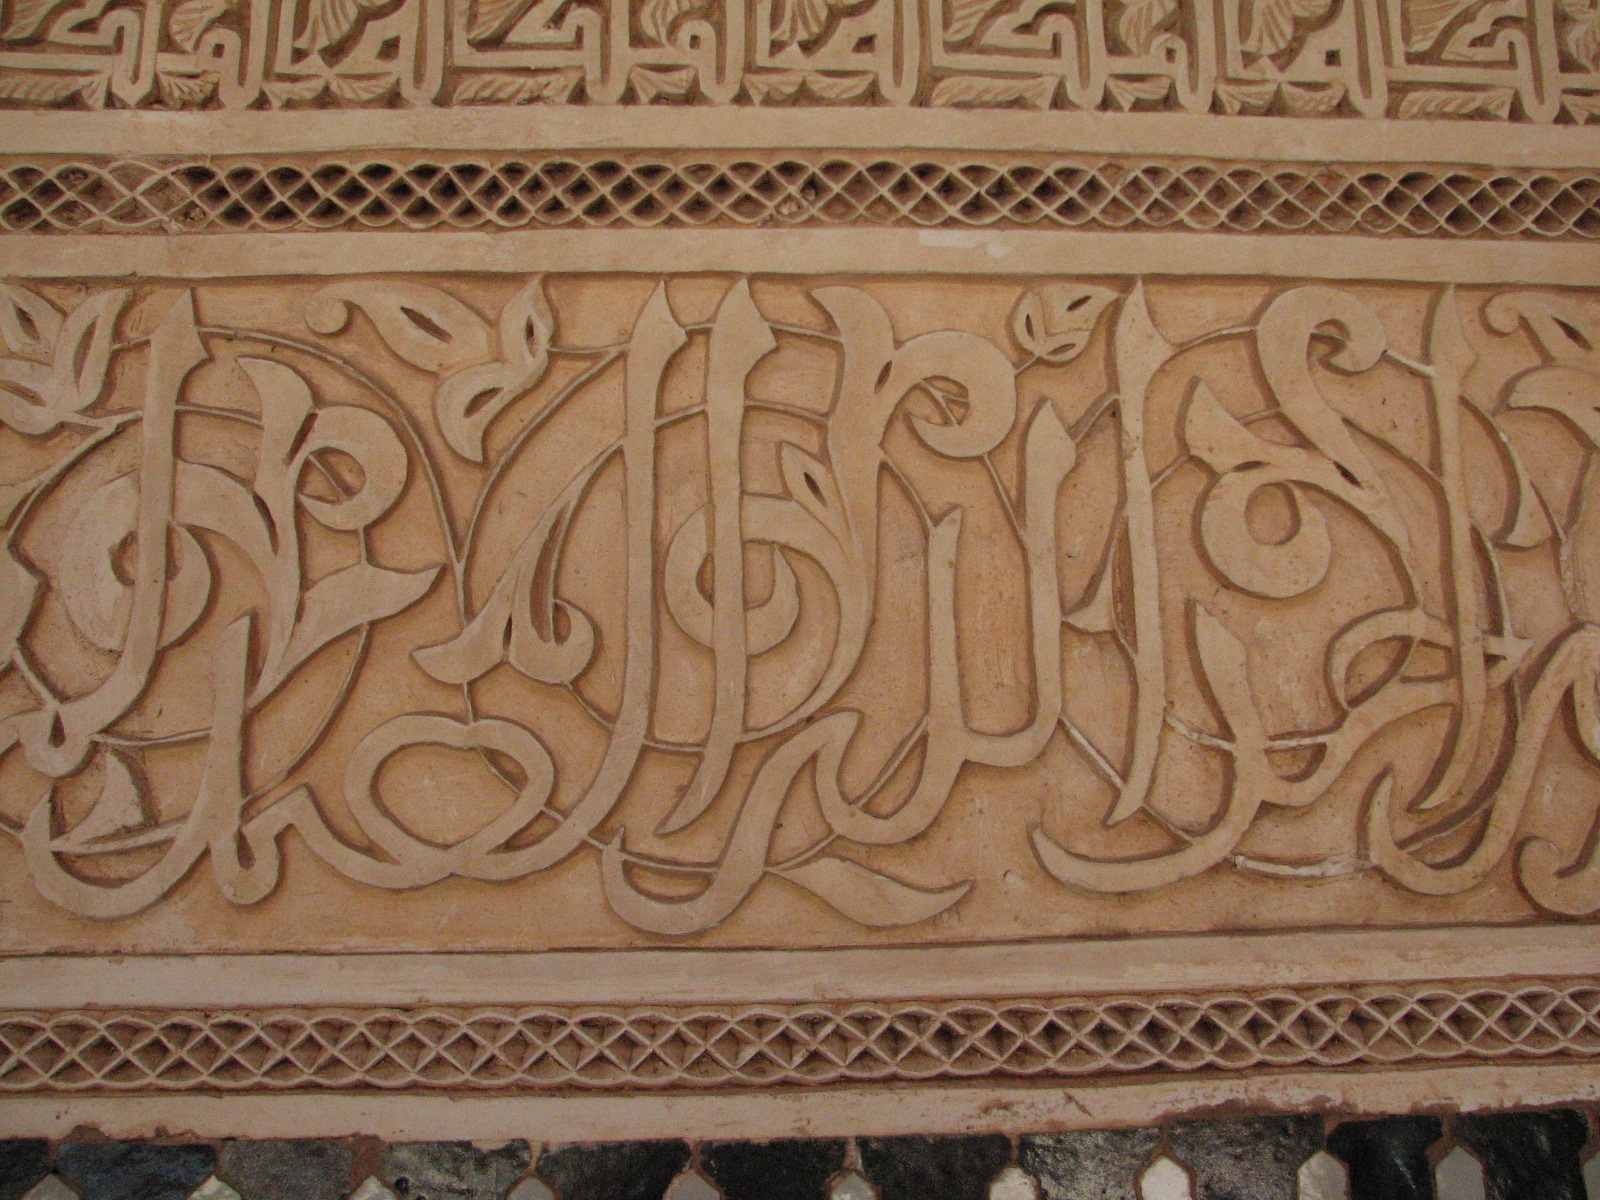 stucco-calligraphy.jpg